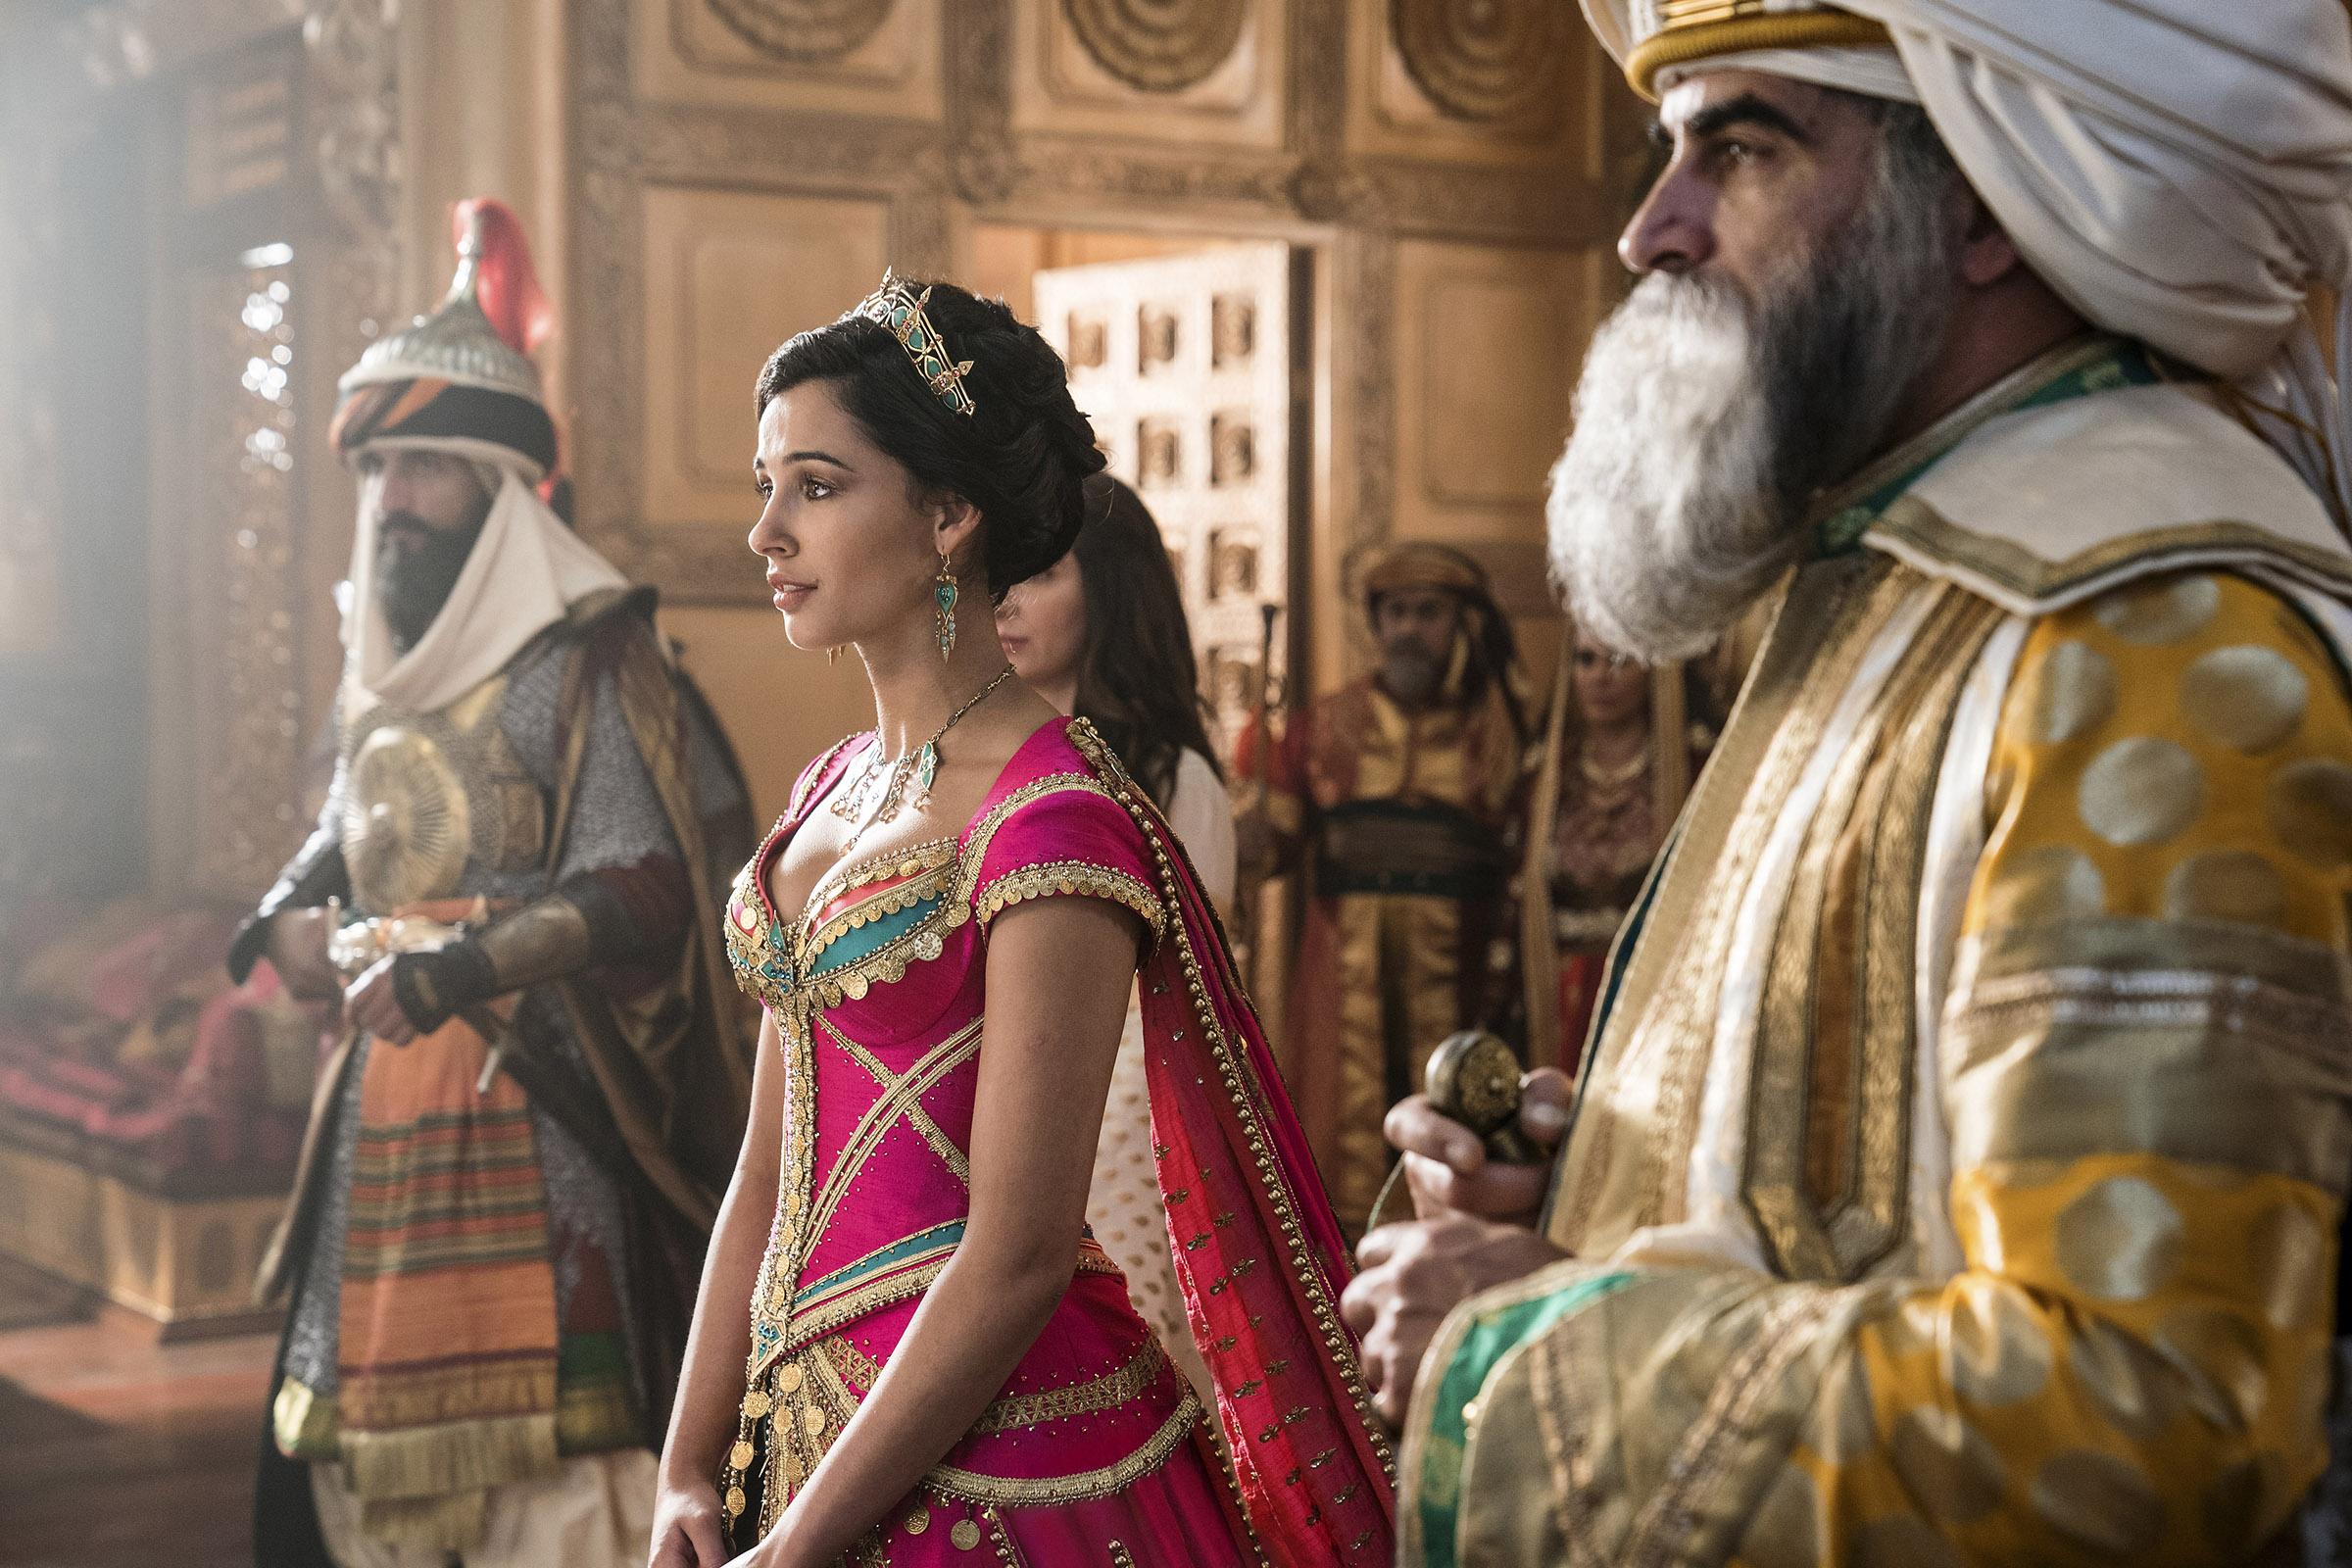 The fraught cultural politics of Disney's new Aladdin remake